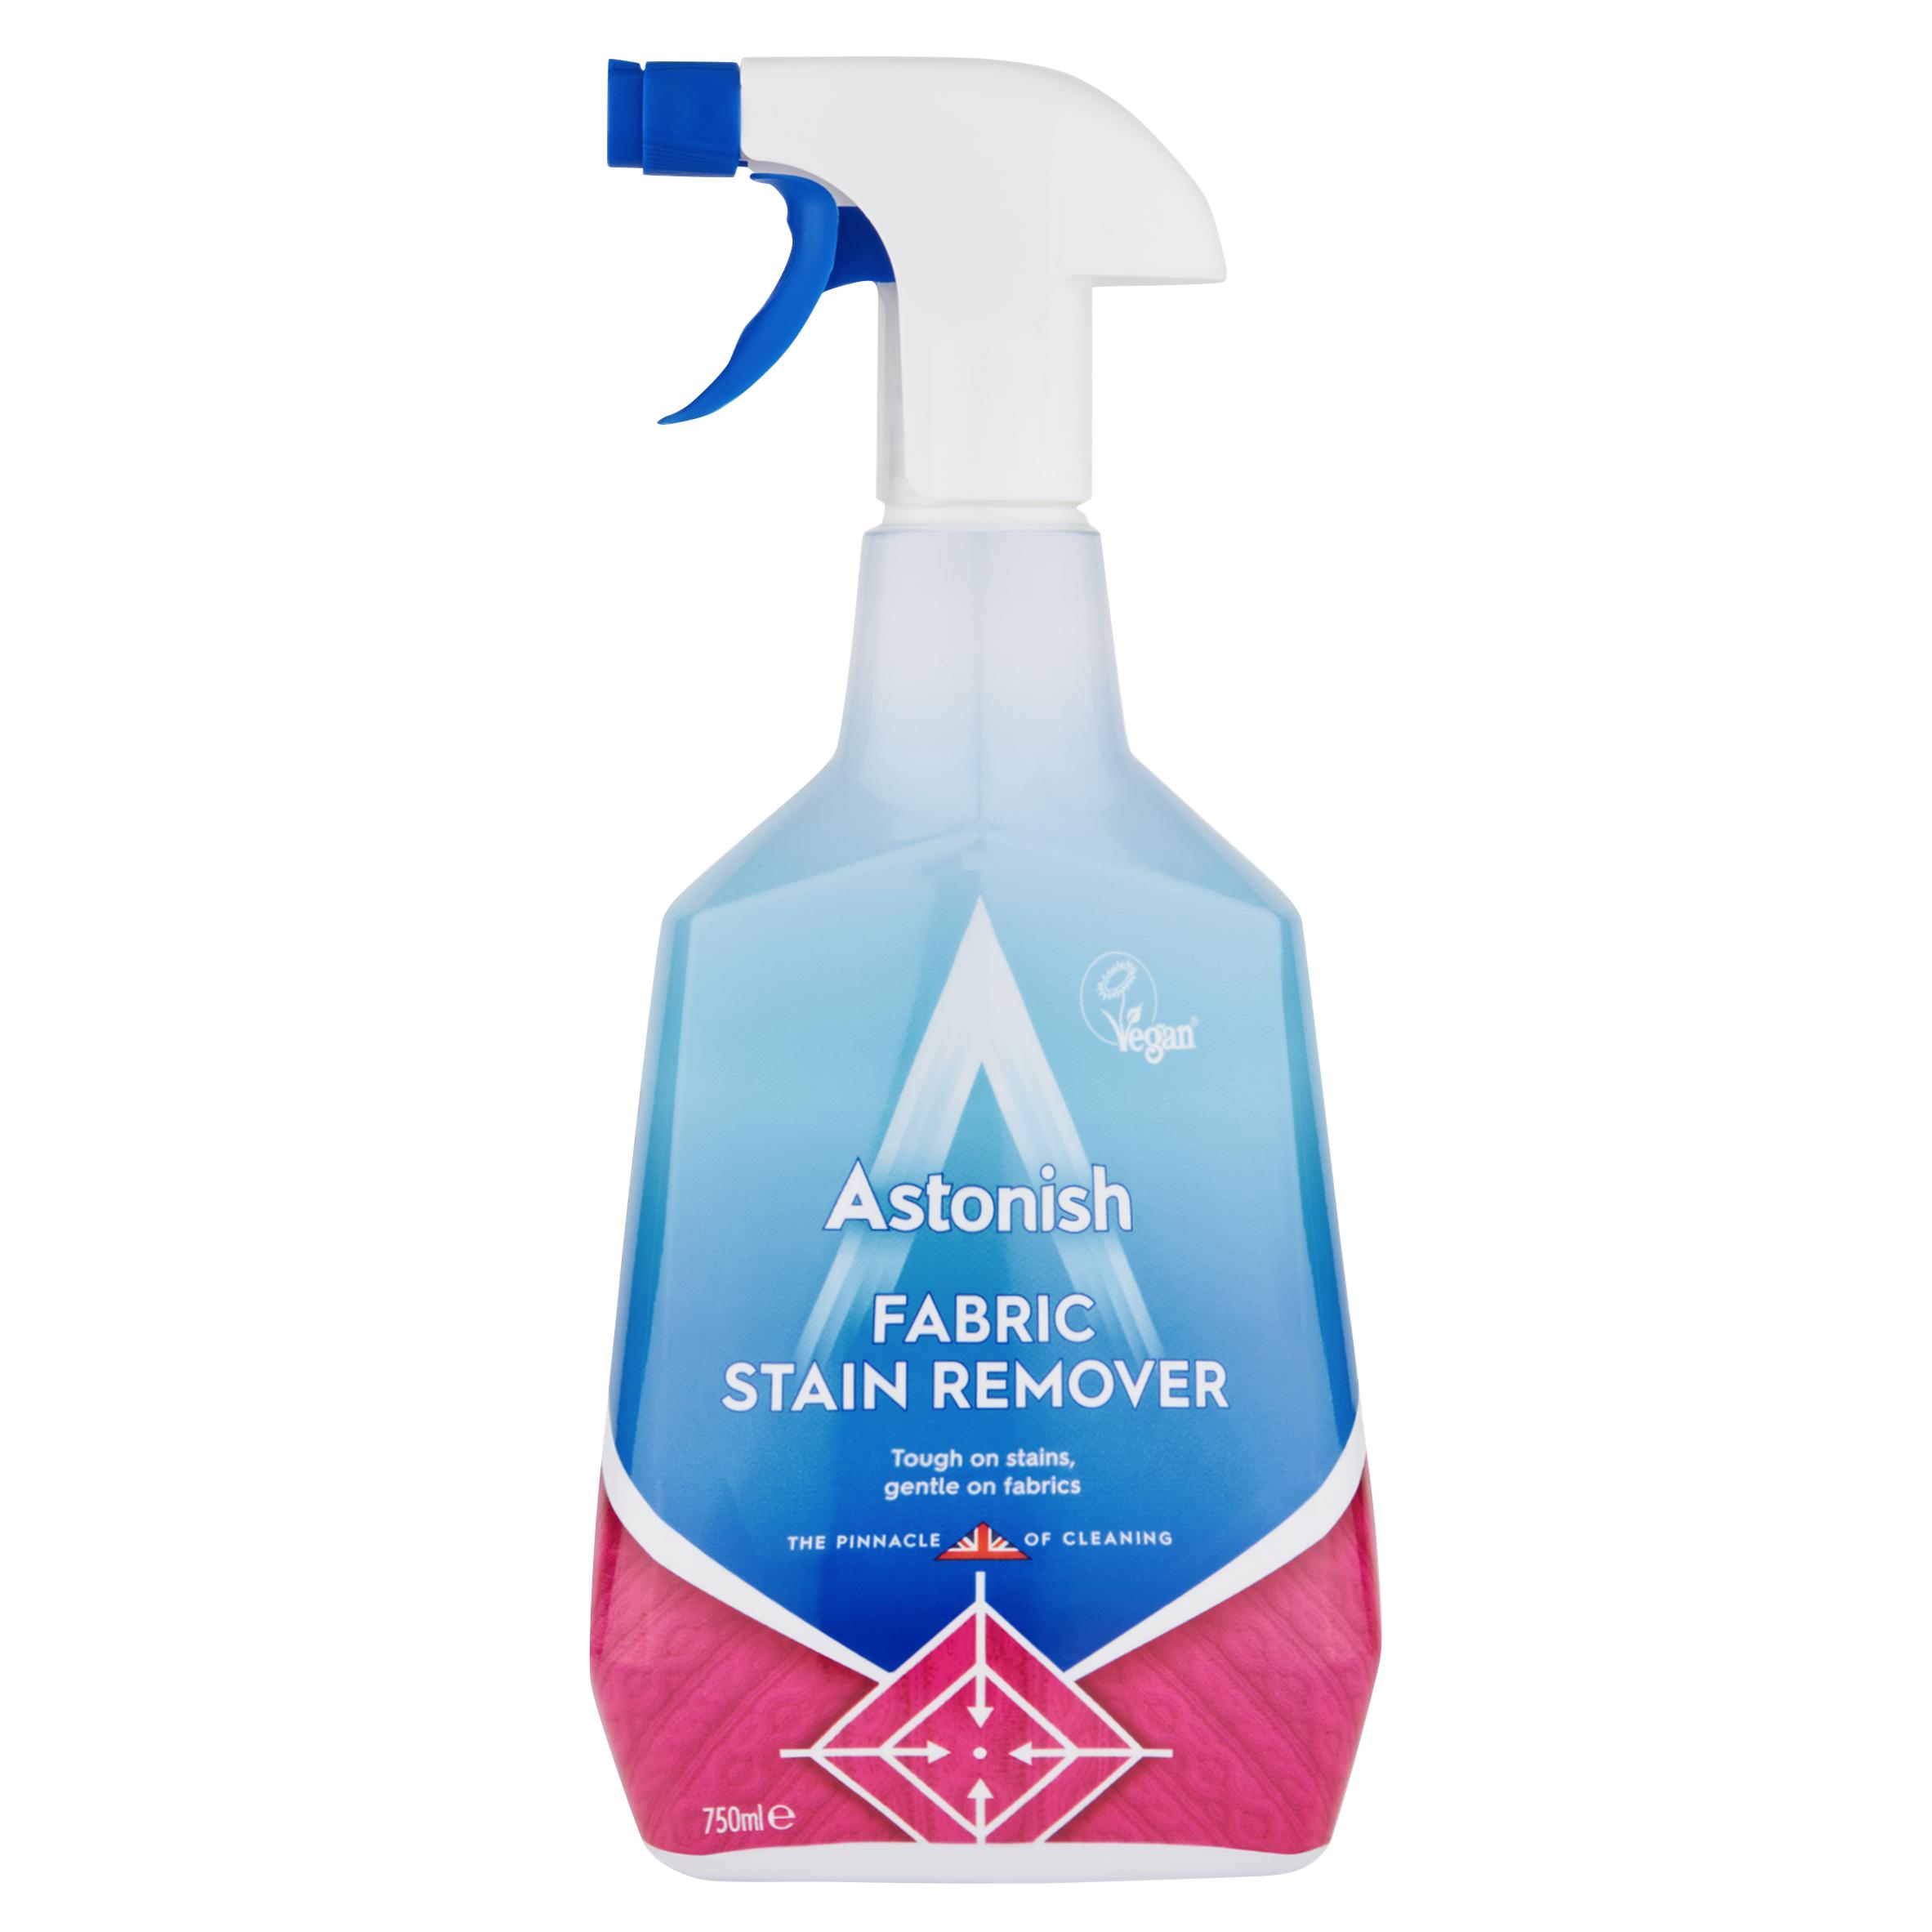 Astonish Fabric Stain Remover Spray 750ml